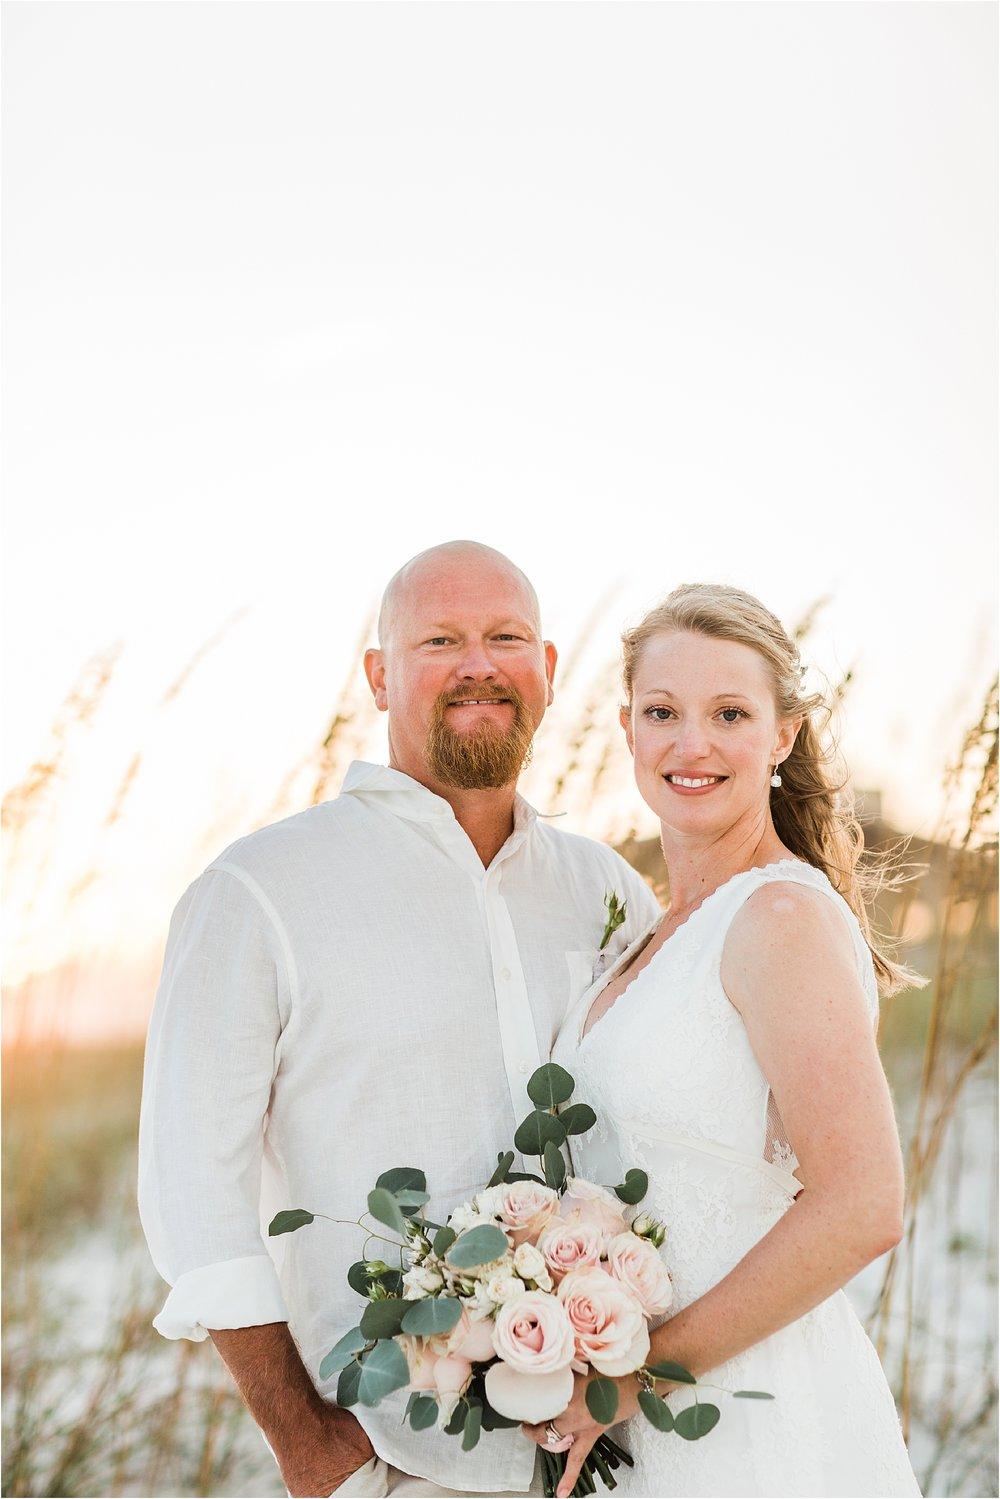 Bridal Bouquet in Gulf Shores, Alabama